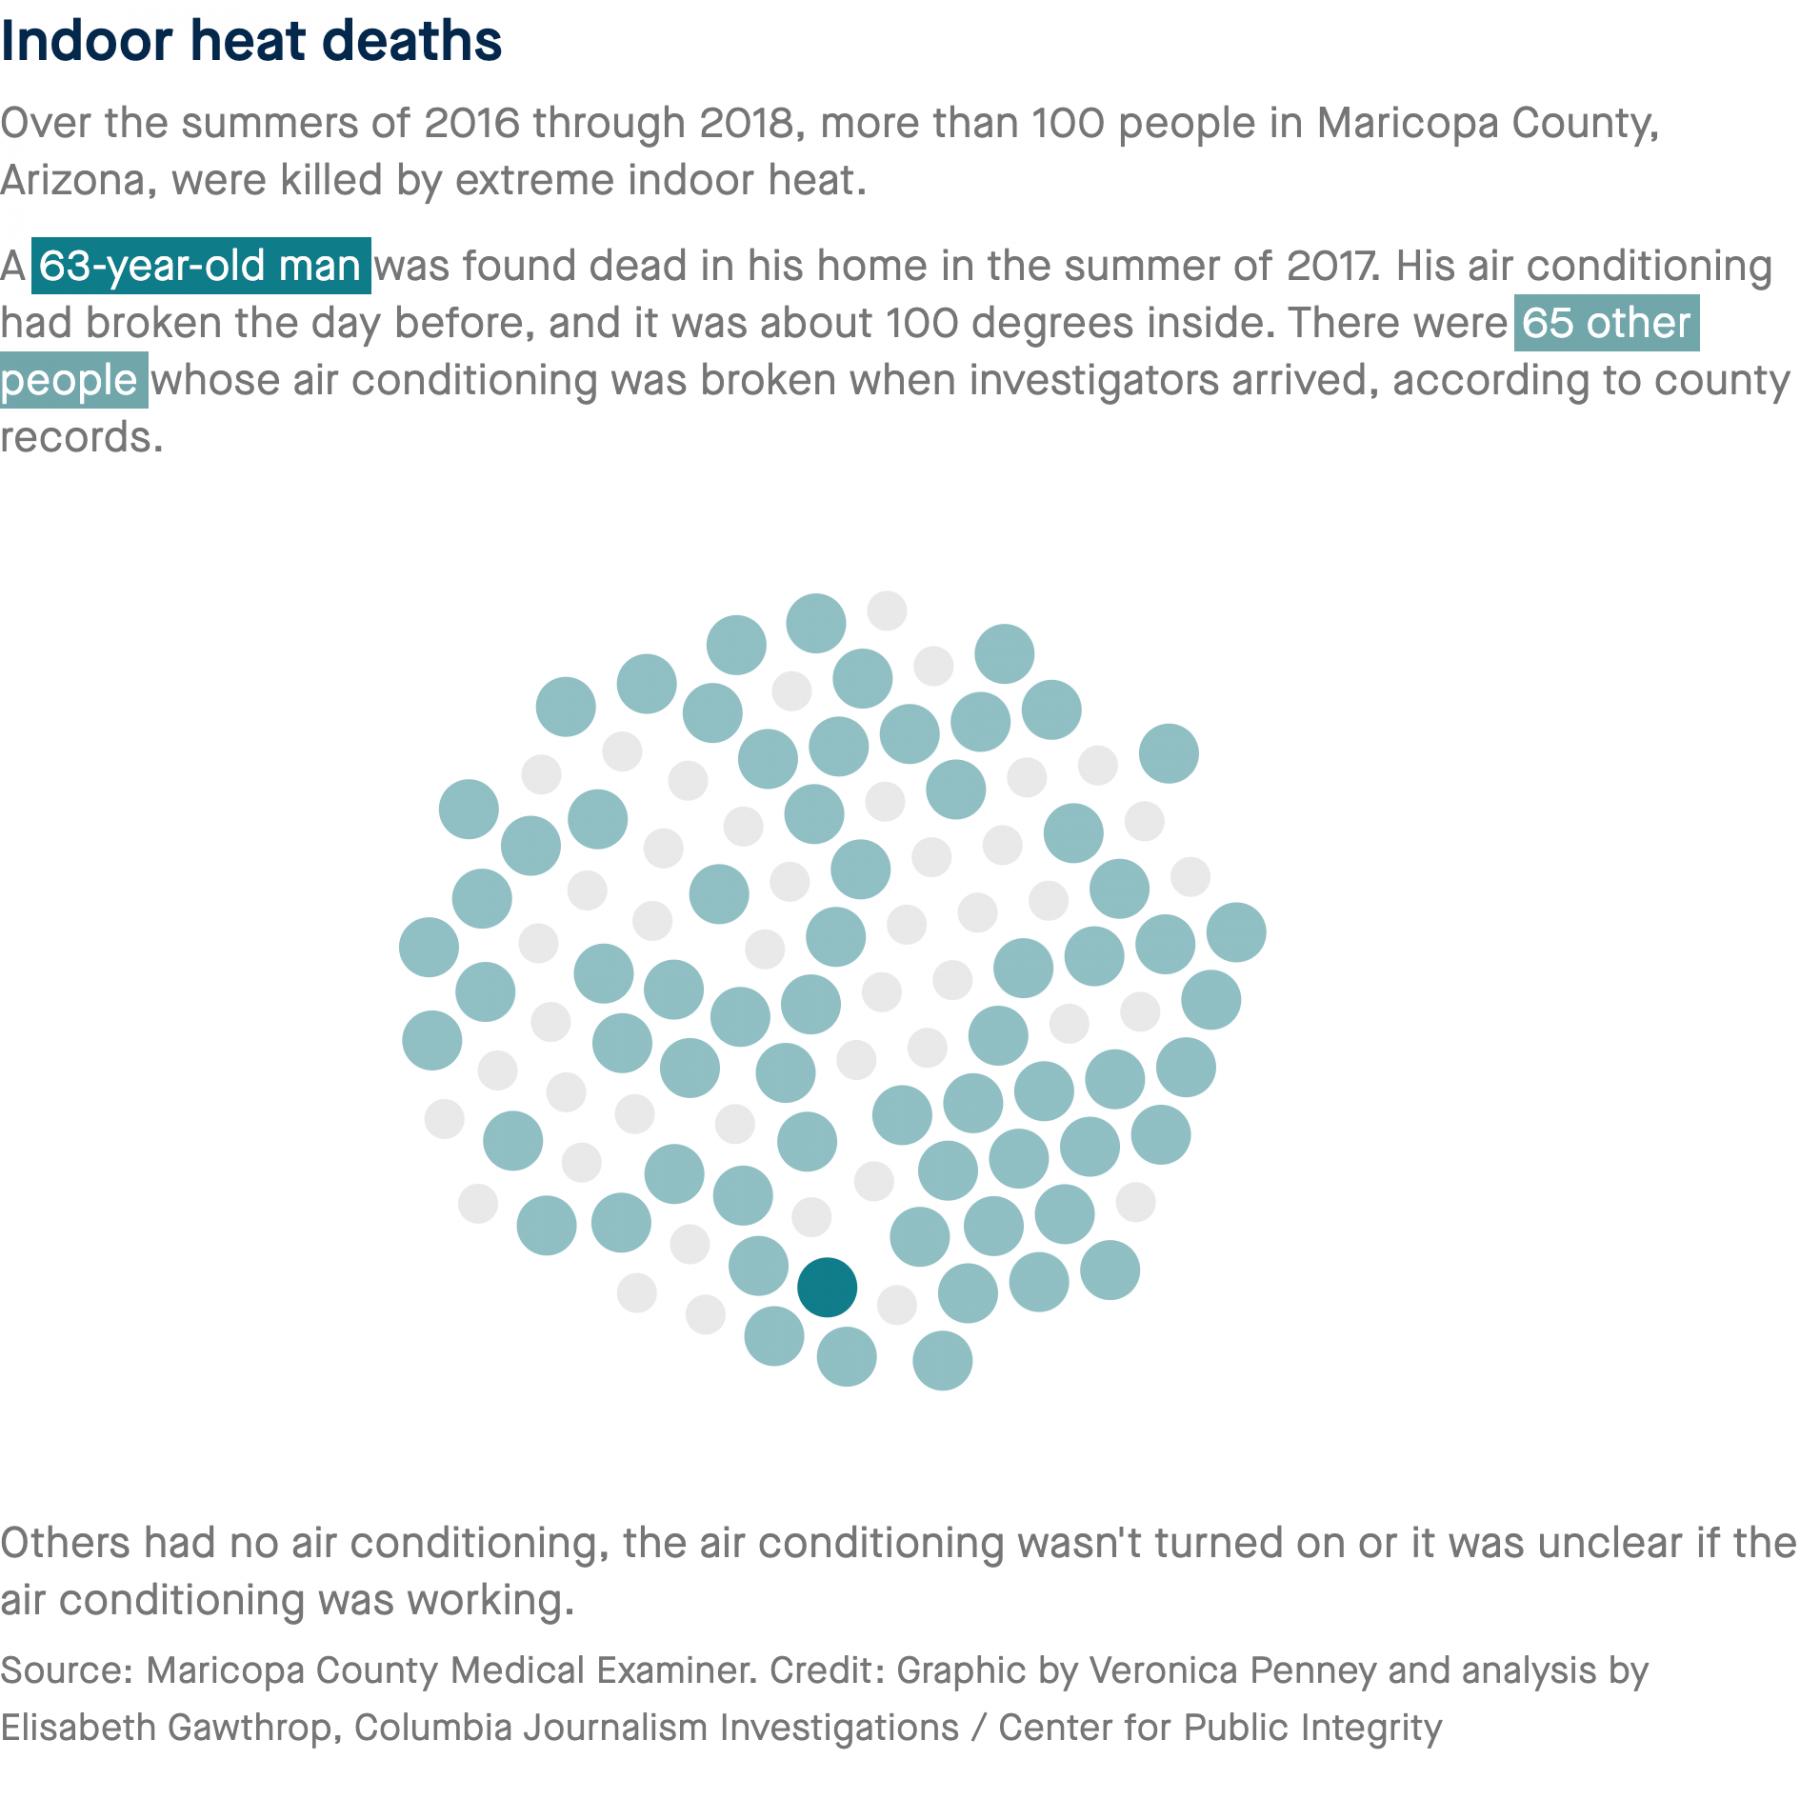 dot visualization of heat deaths